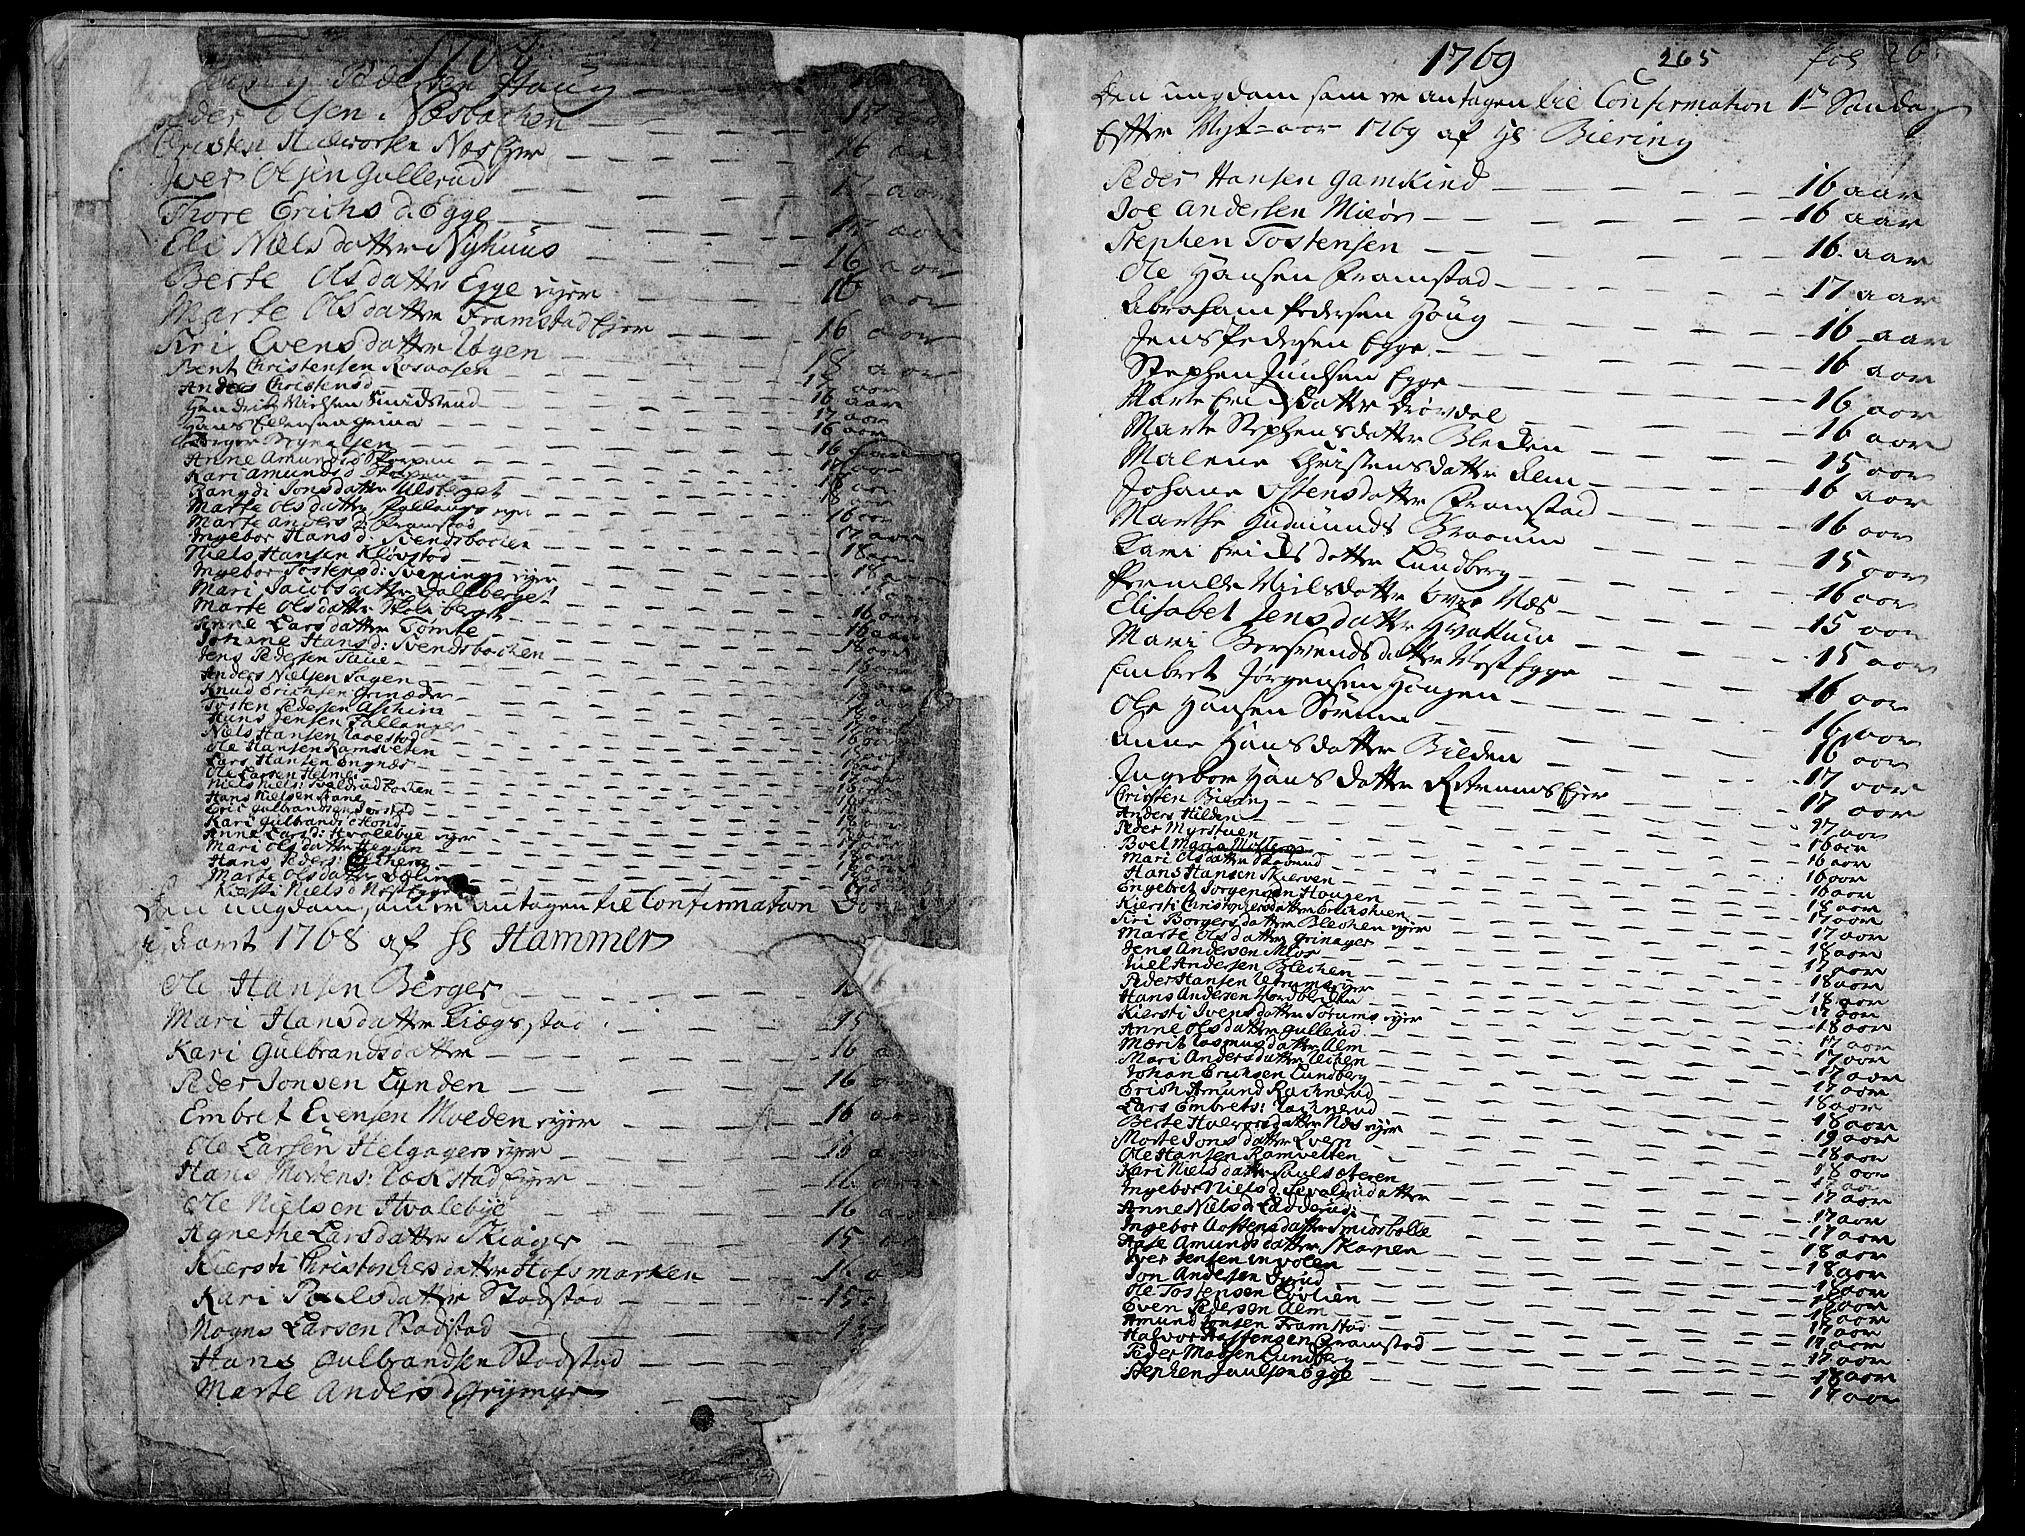 SAH, Gran prestekontor, Ministerialbok nr. 4, 1759-1775, s. 265